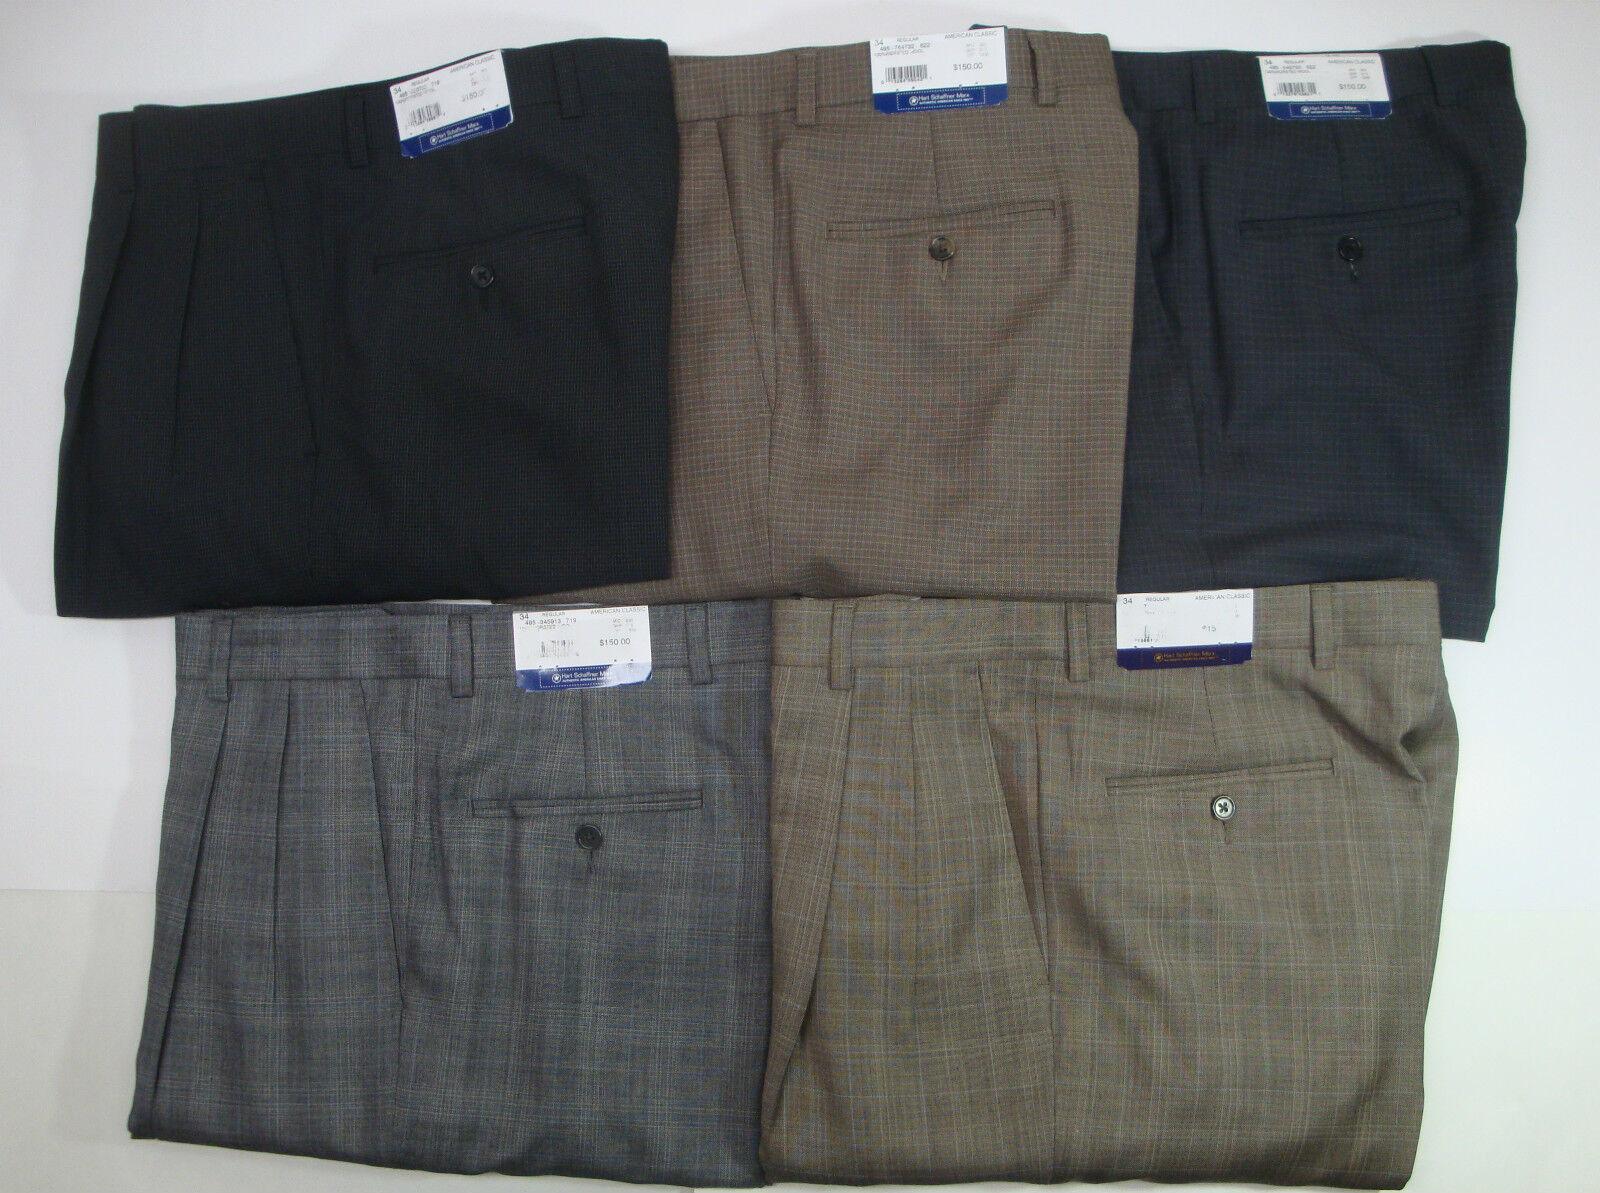 NWT  HART SCHAFFNER MARX WOOL CLASSIC DRESS PANTS MENS 32 34 35 NEW